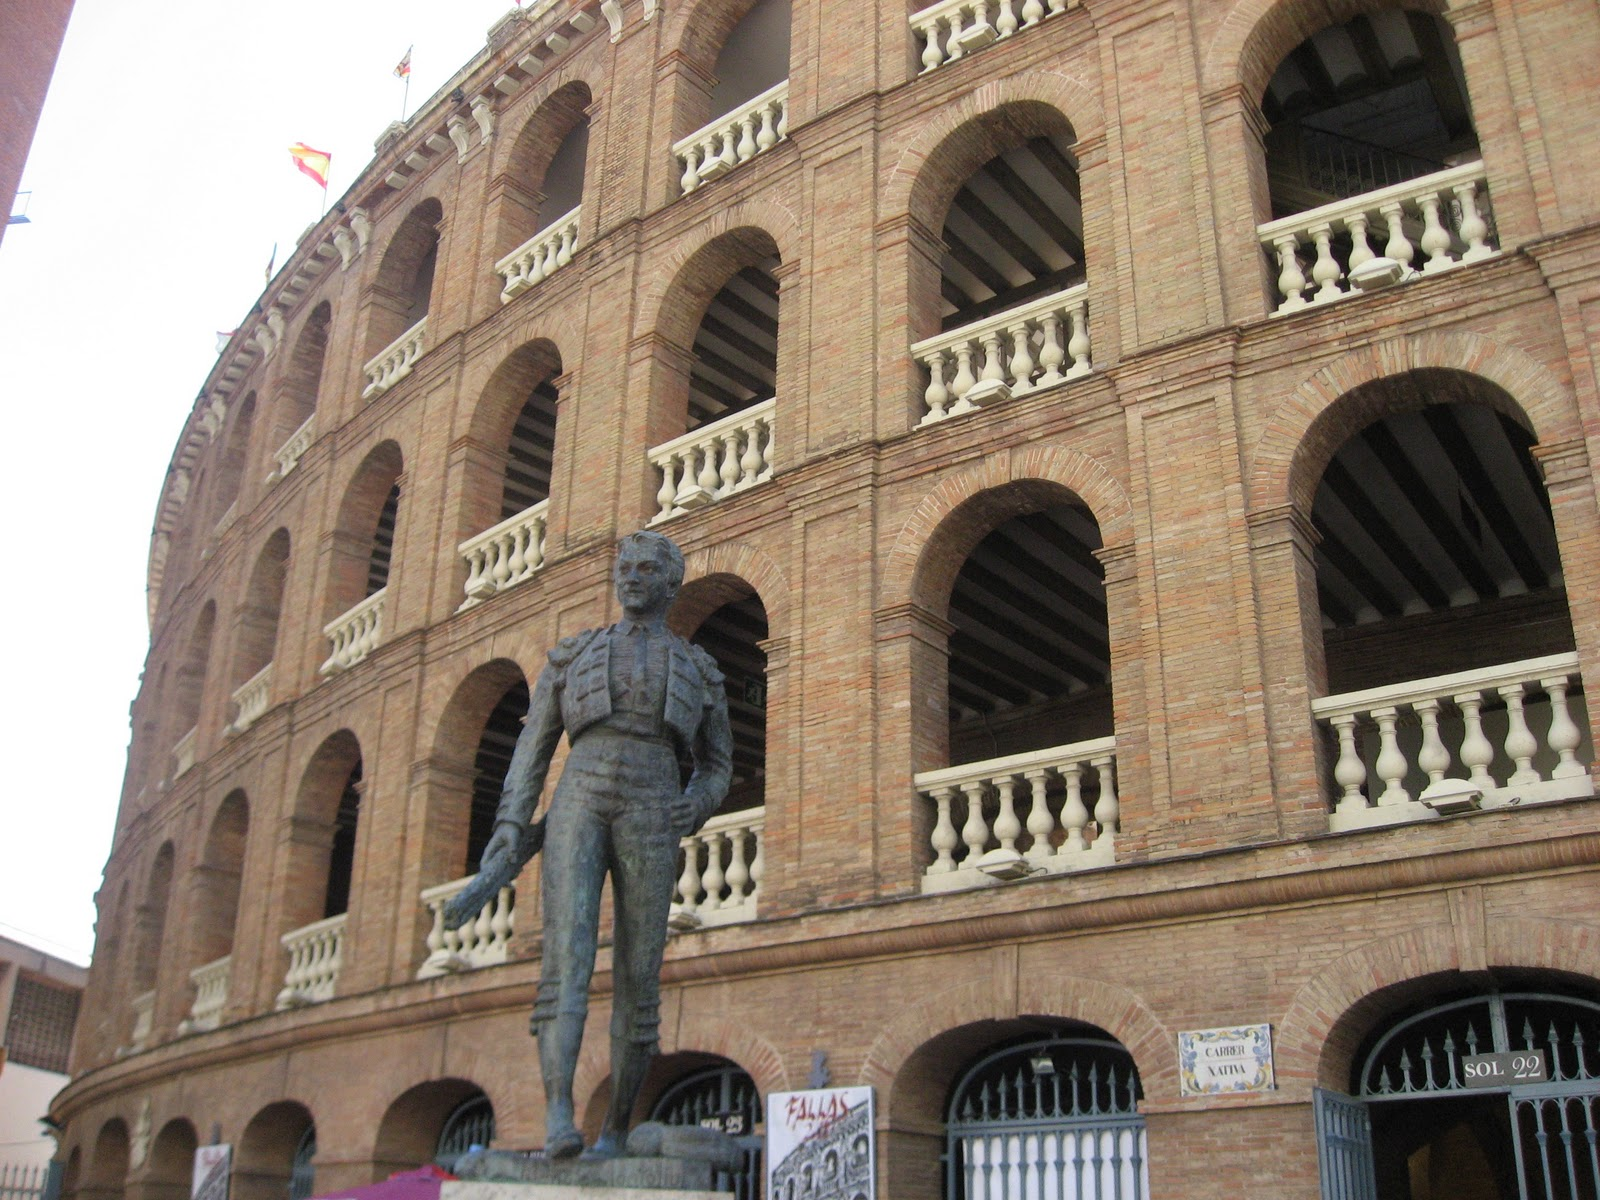 Fotos 360 Estatua de Manolo Montoliu. #VidePan por #Valencia